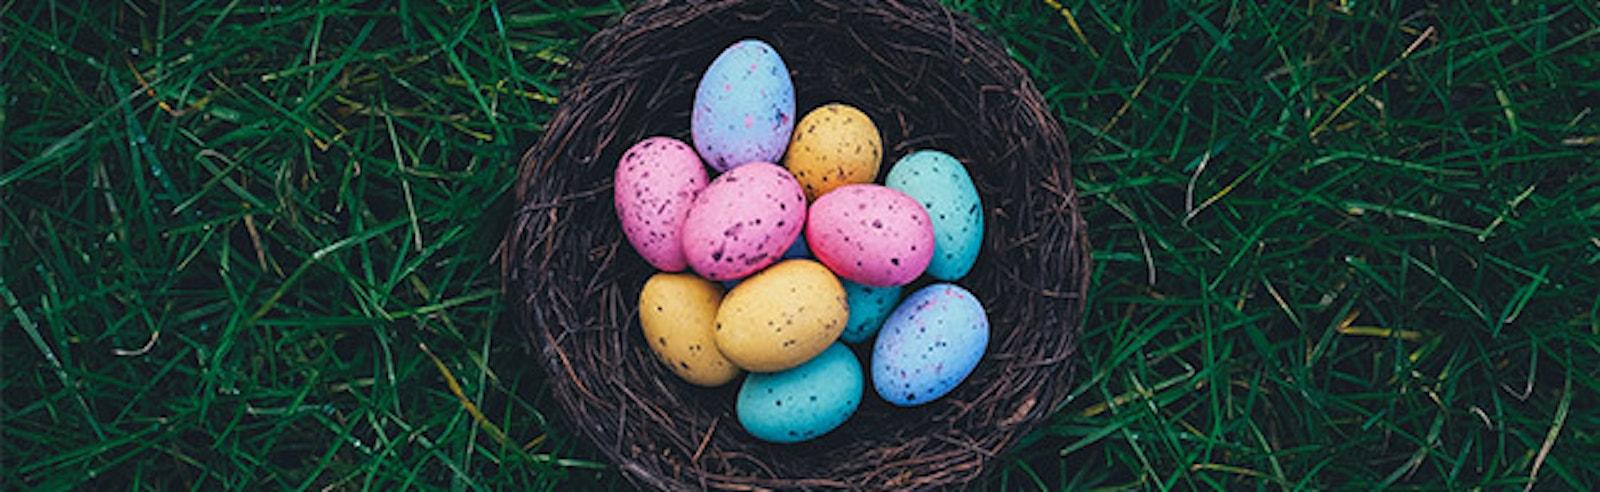 Easter Eggs In Basket Blog